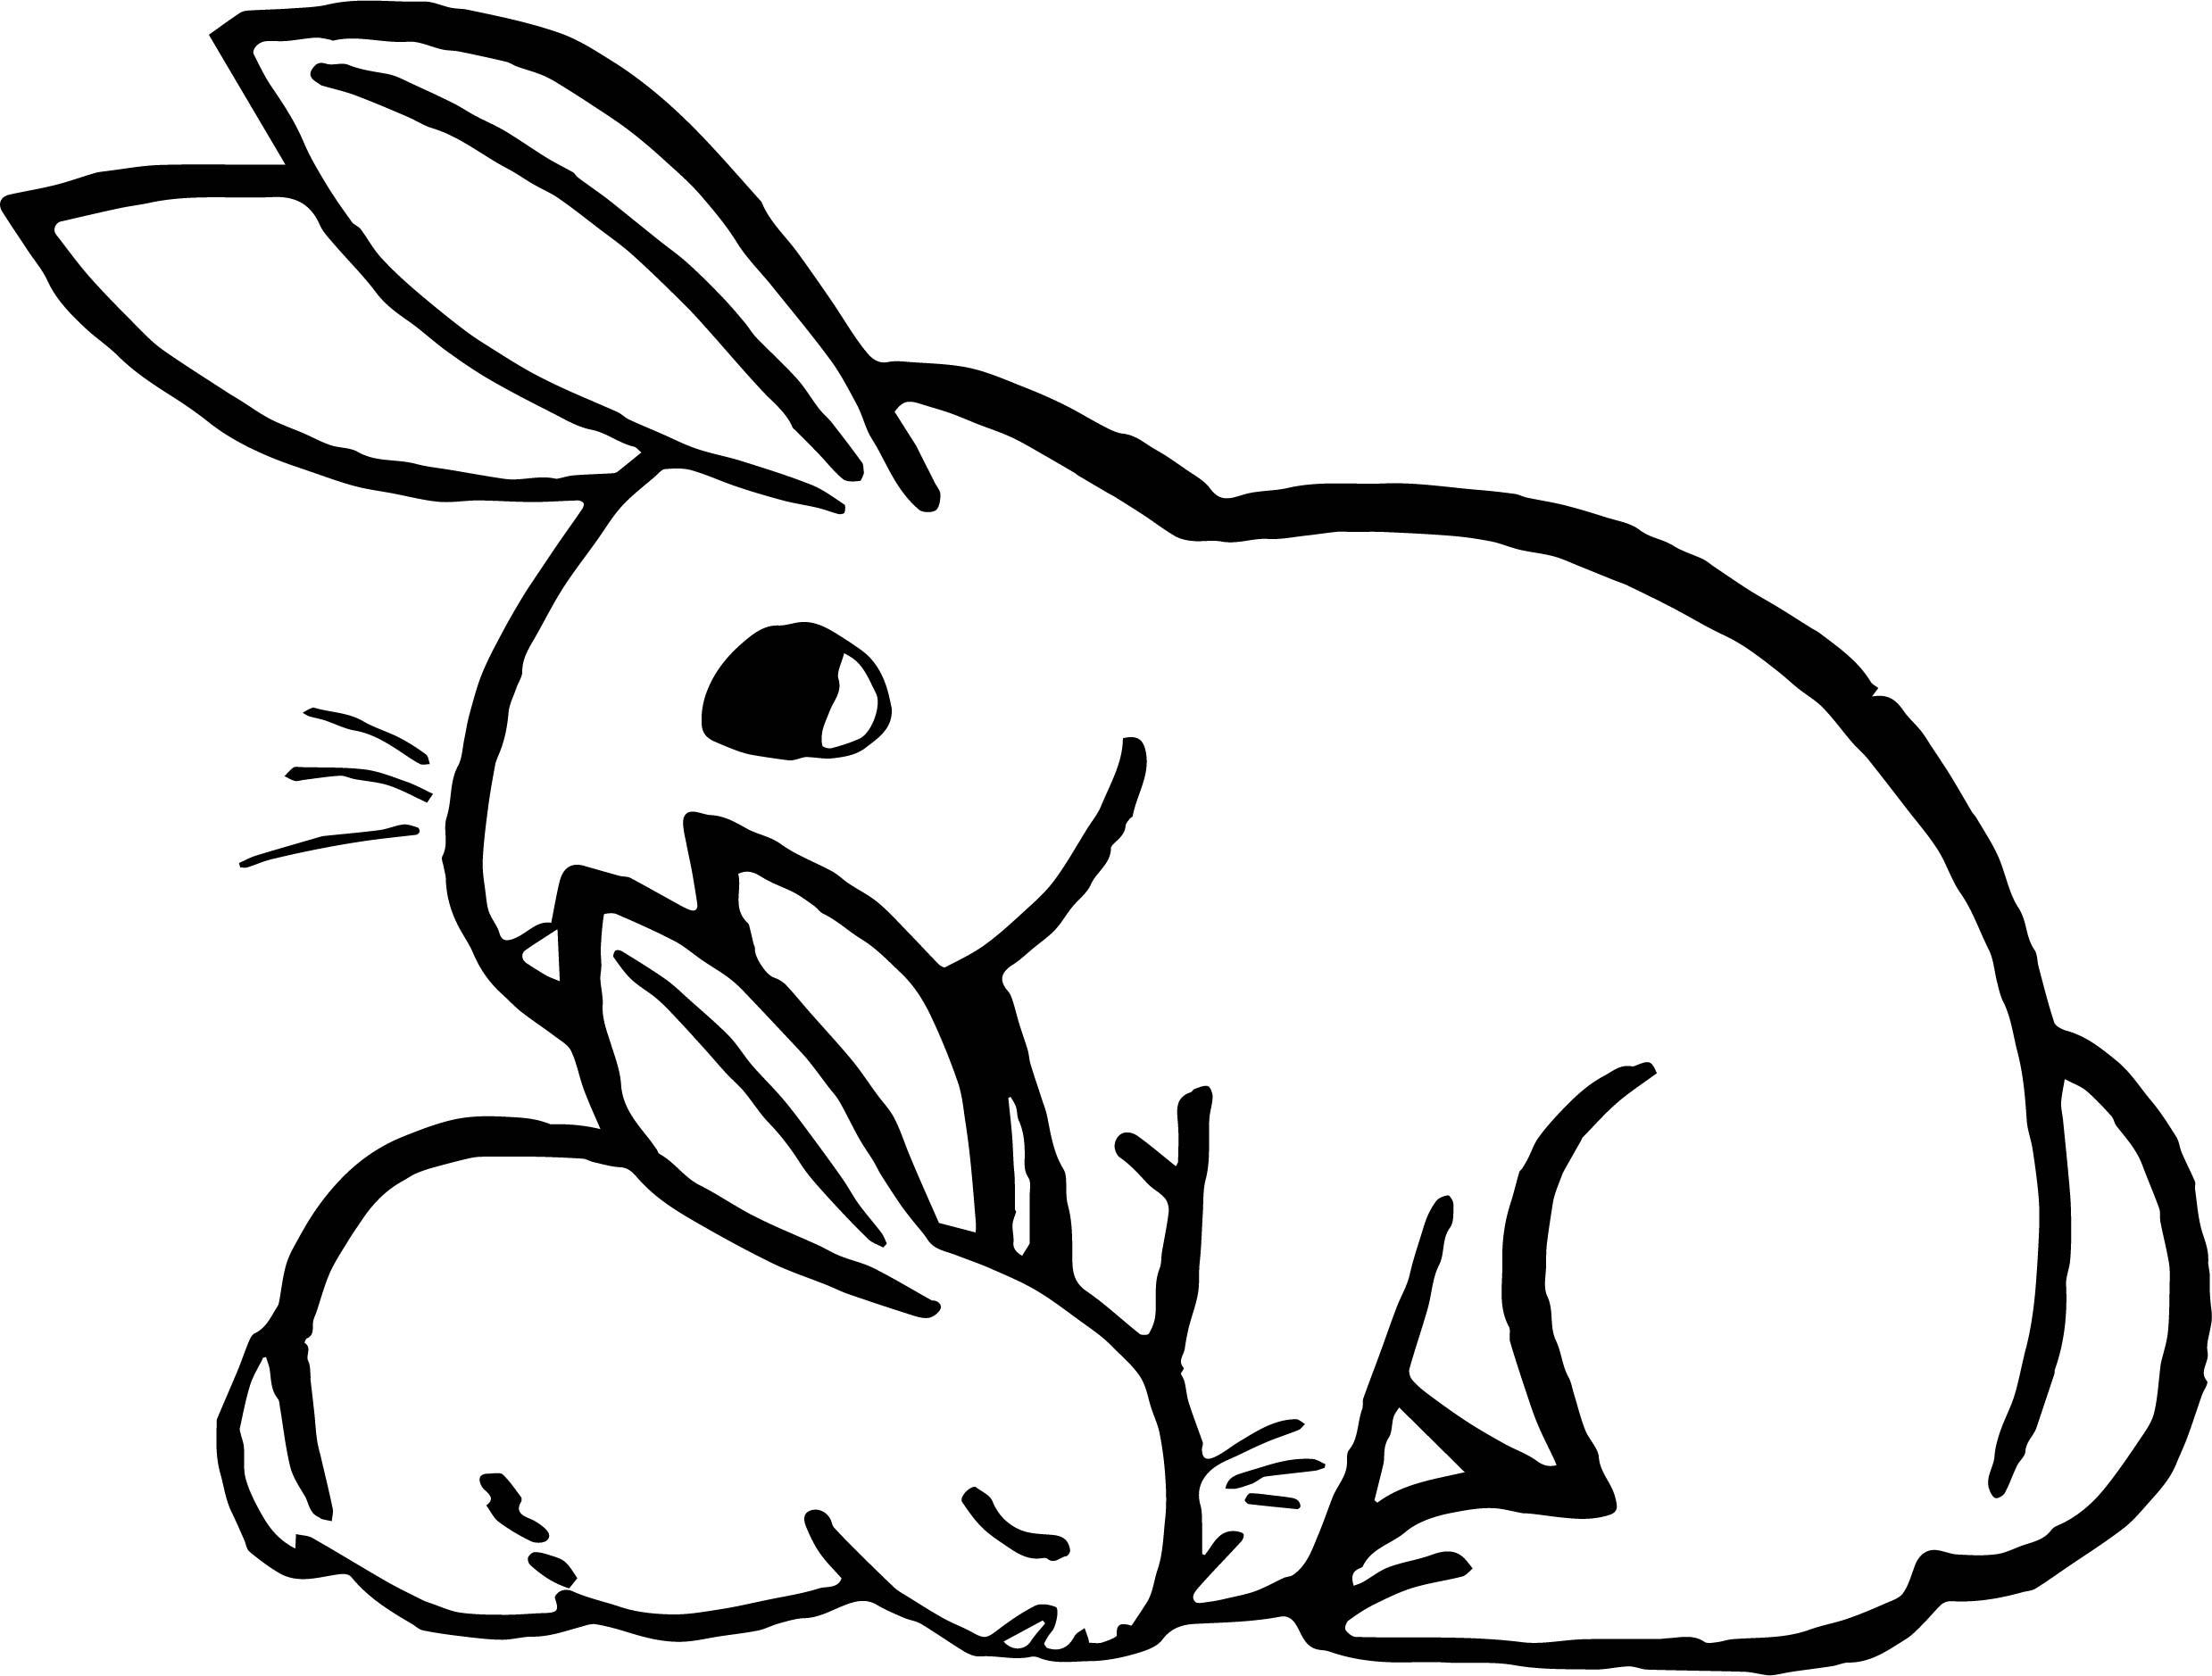 Rabbit Animal Coloring Page